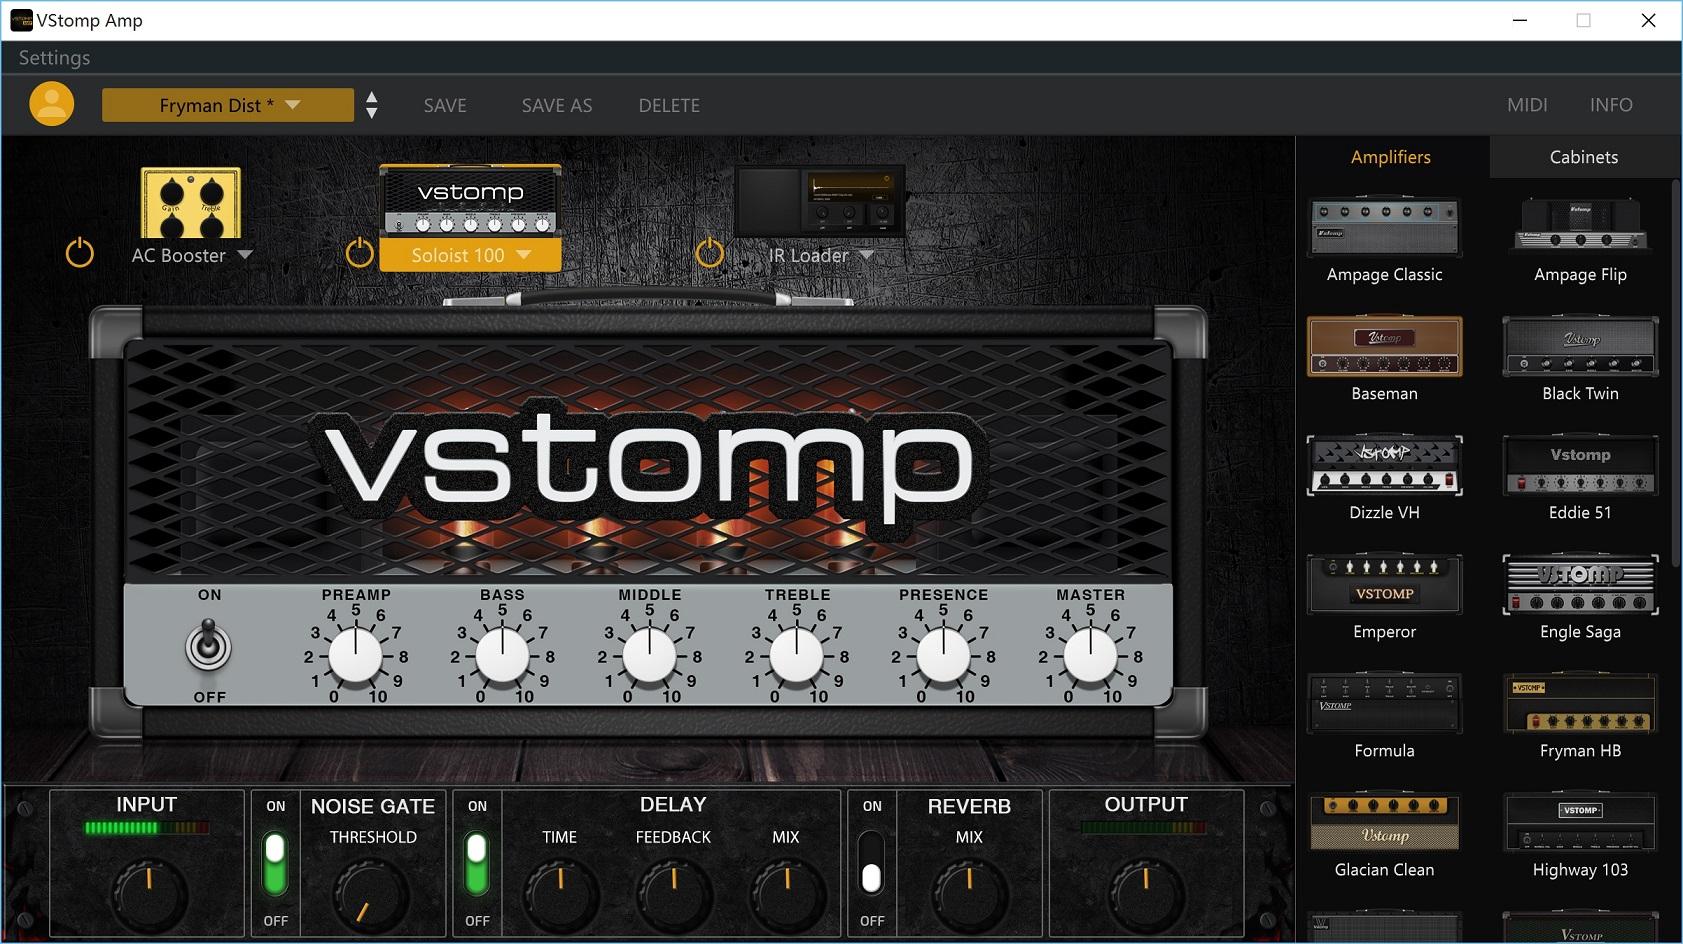 kvr vstomp amp by hotone audio mp guitar effects vst plugin audio units plugin vst 3 plugin. Black Bedroom Furniture Sets. Home Design Ideas